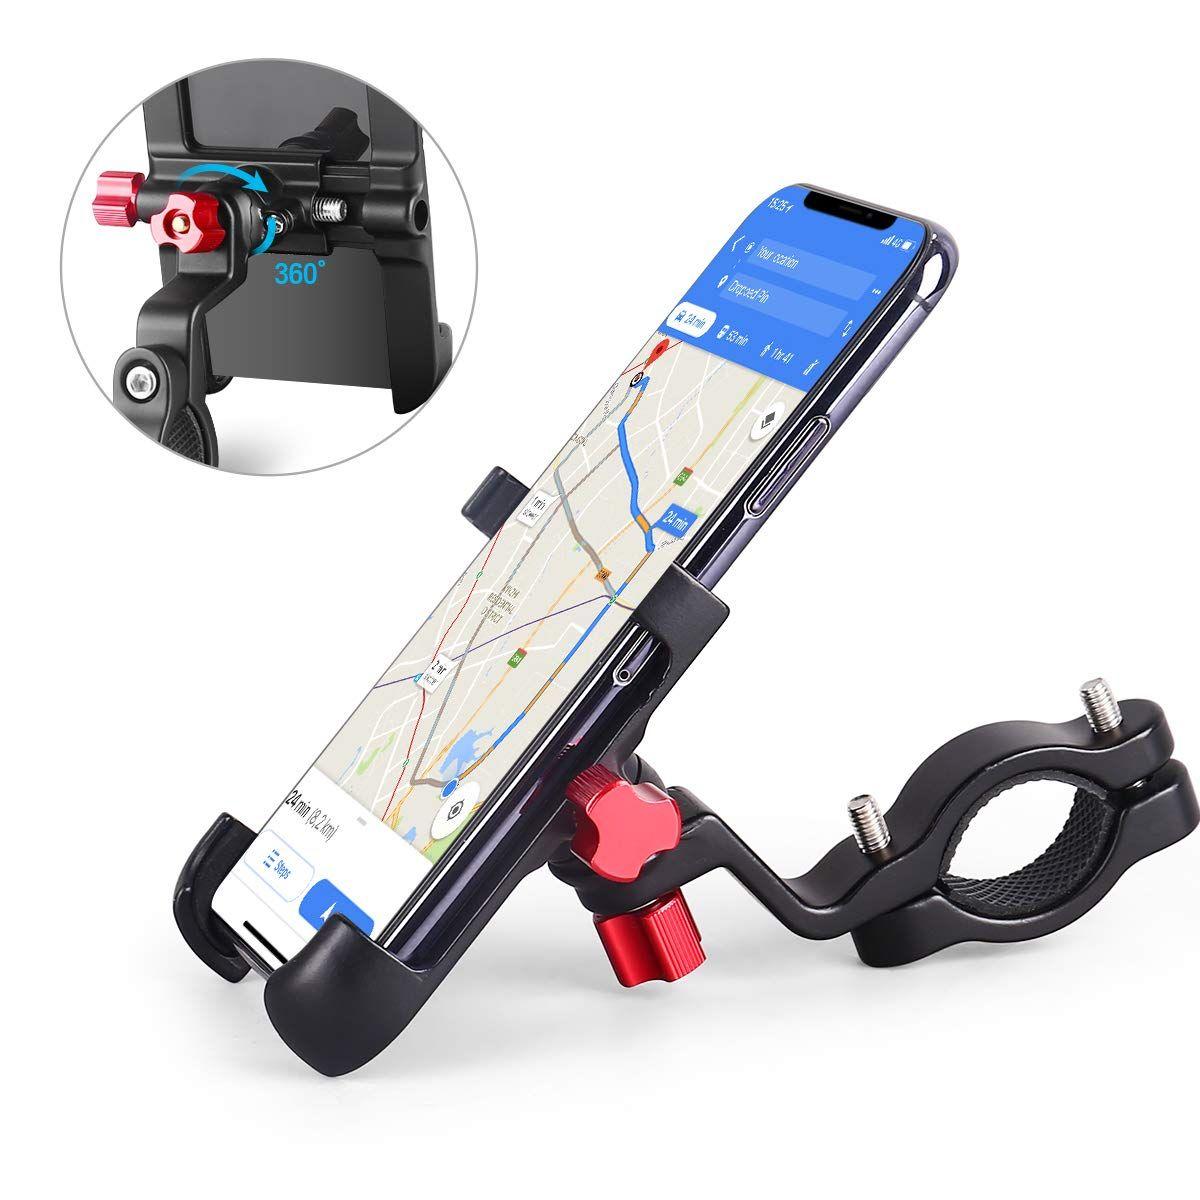 Homeasy Universal Bike Phone Mount Bicycle Holder Handlebar